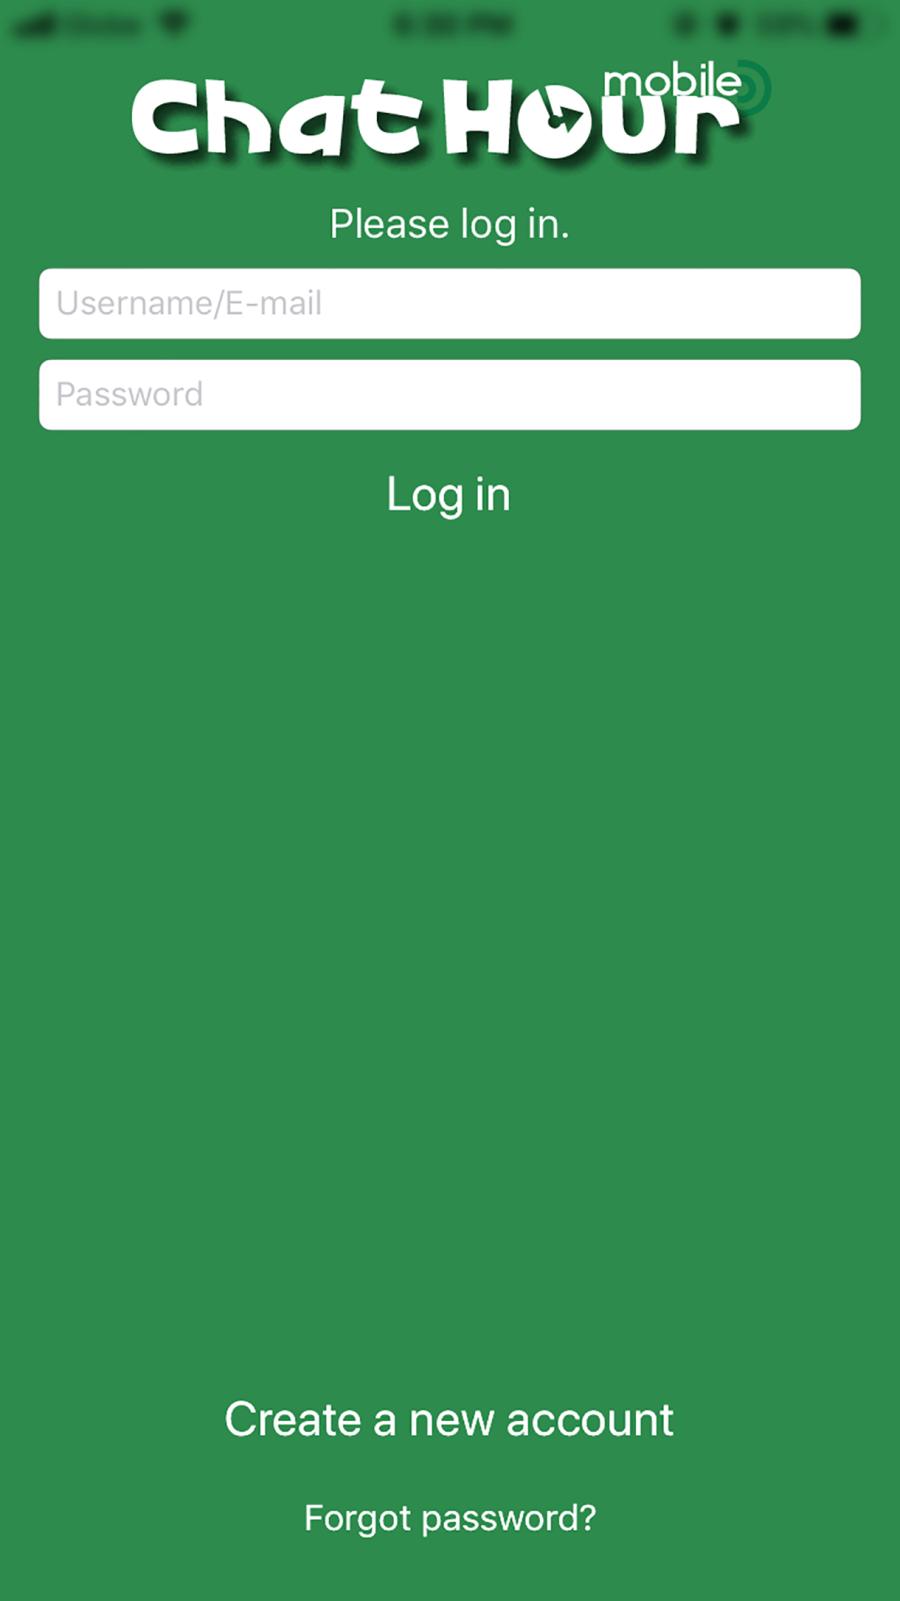 Chat Hour App Login